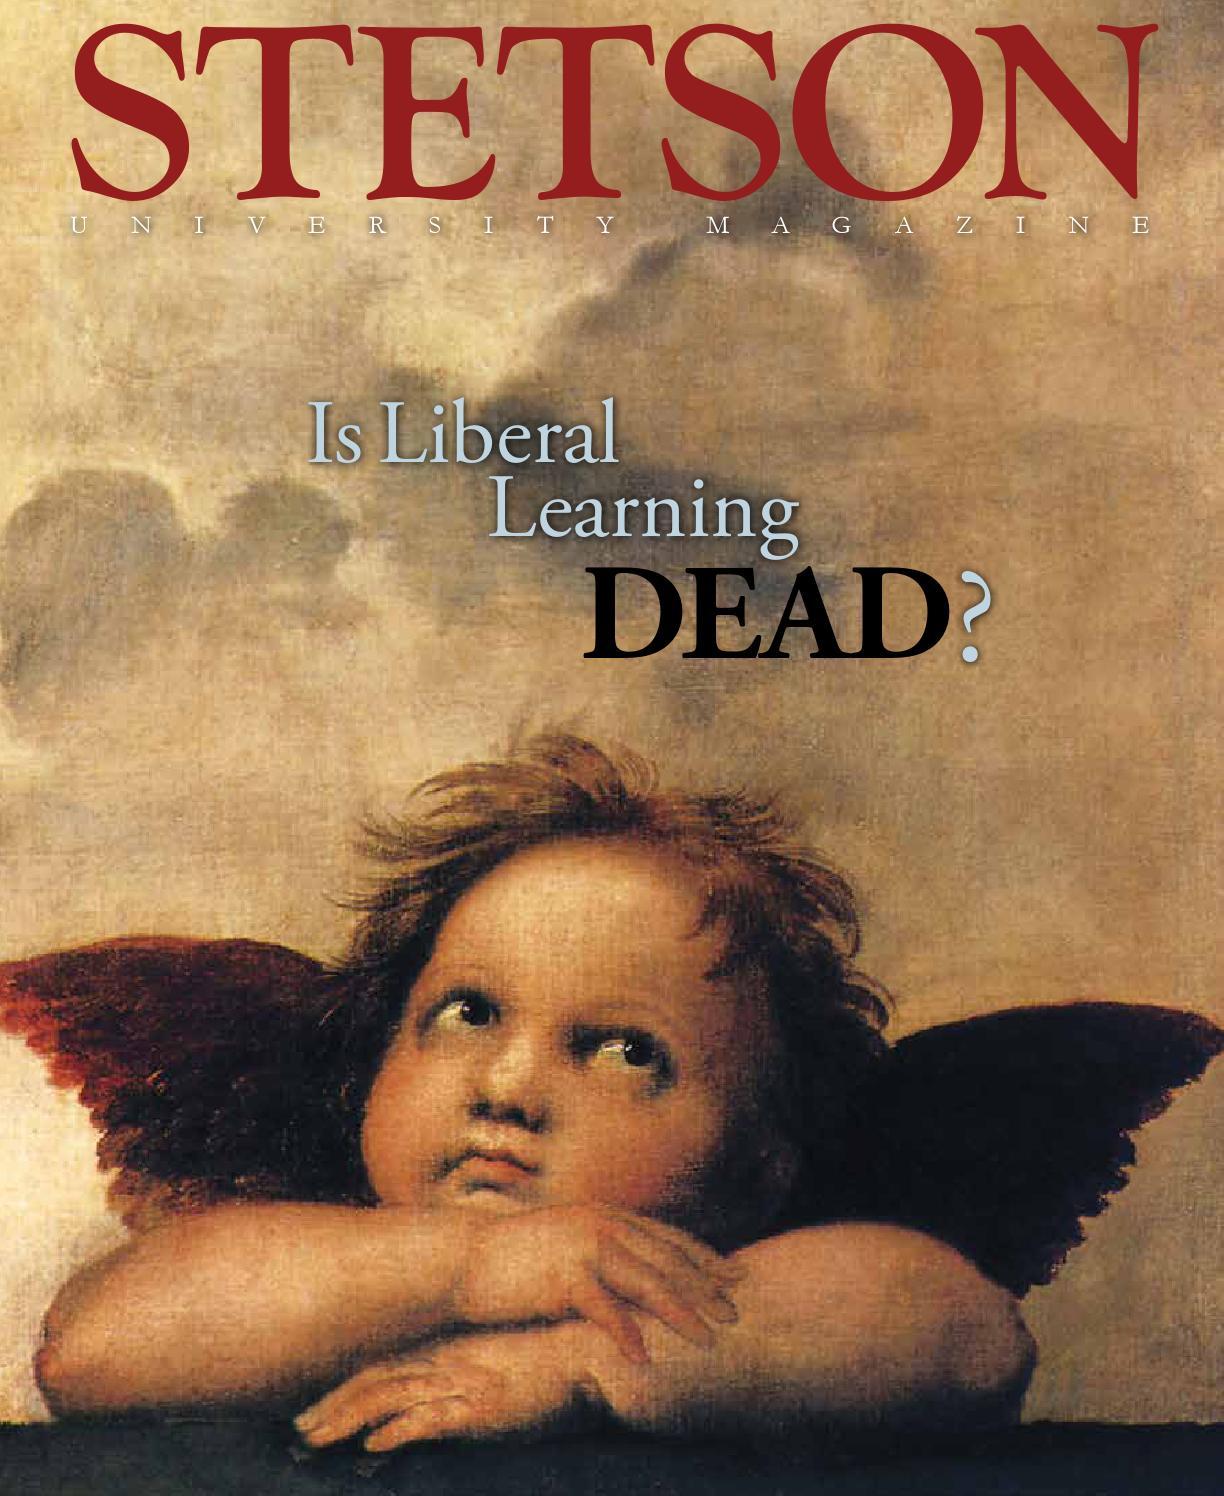 Stetson Magazine By University Issuu Florida Mediation Locations Ken Bowen Esq Pinellas